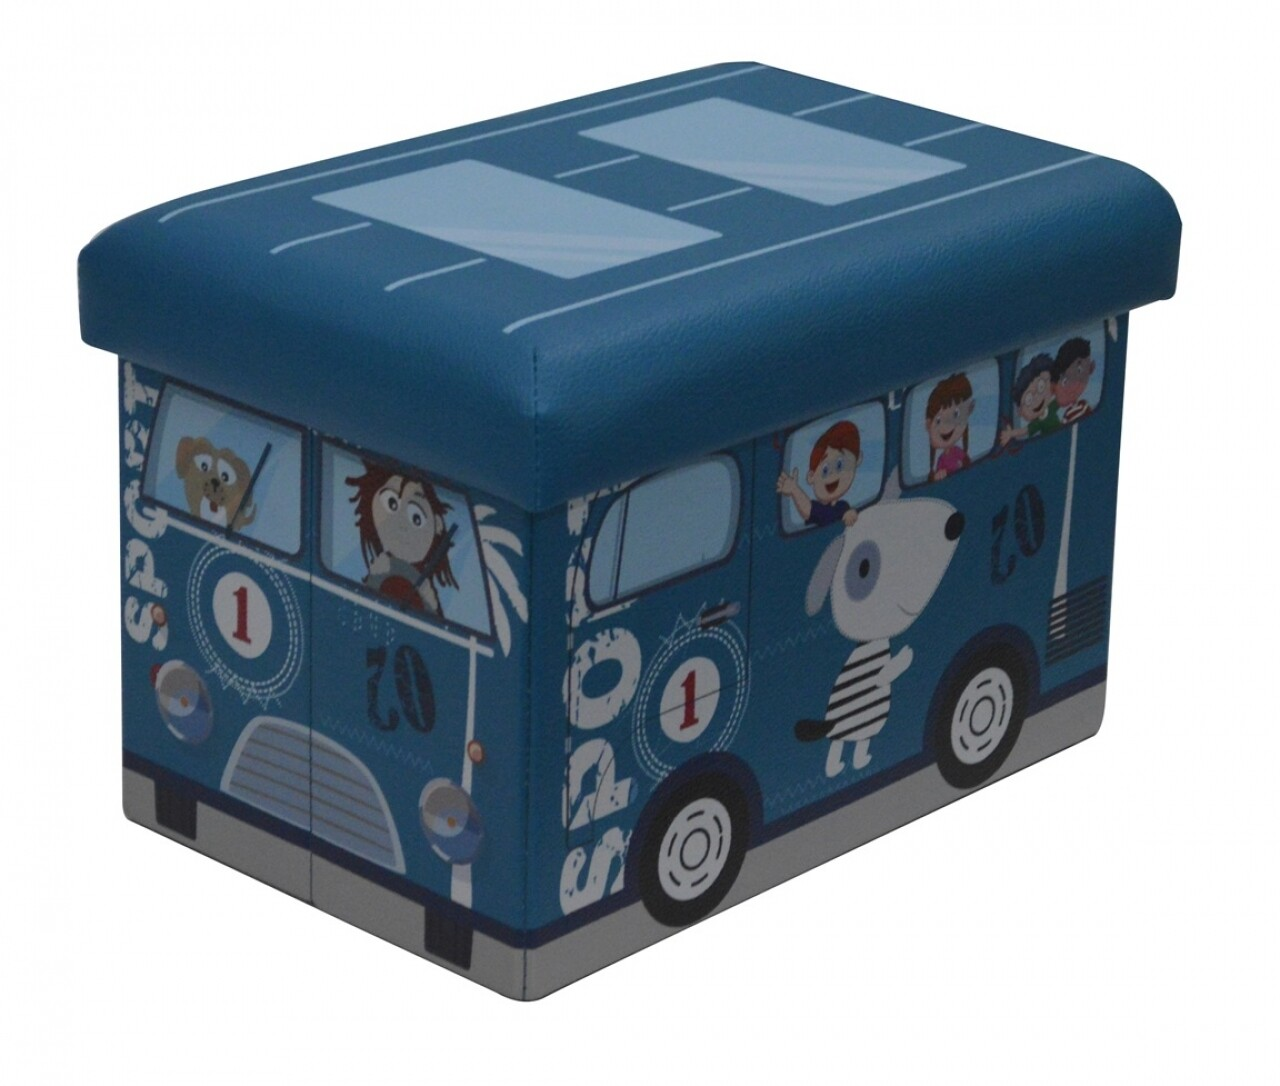 Taburet pliabil cu spatiu de depozitare Blue Bus, Heinner Home, 24.5 x 25 x 38 cm, PVC, albastru